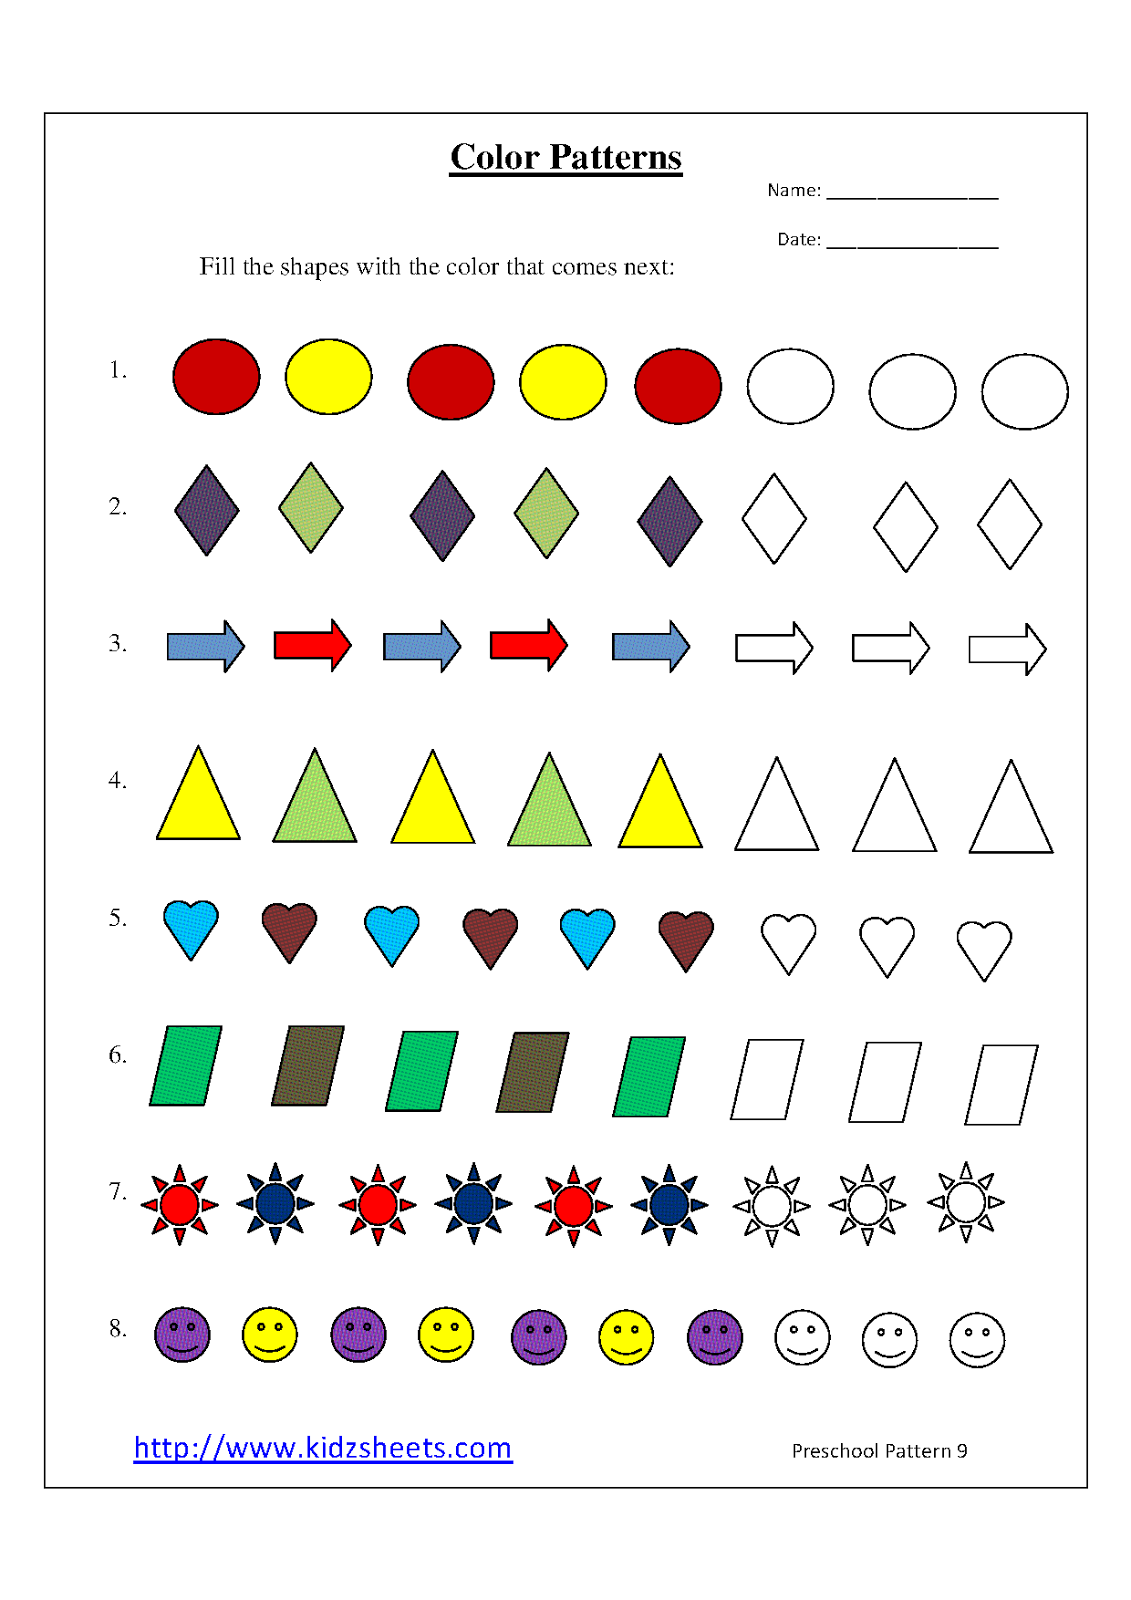 Kidz Worksheets: Preschool Color Patterns Worksheet9 [ 1600 x 1131 Pixel ]